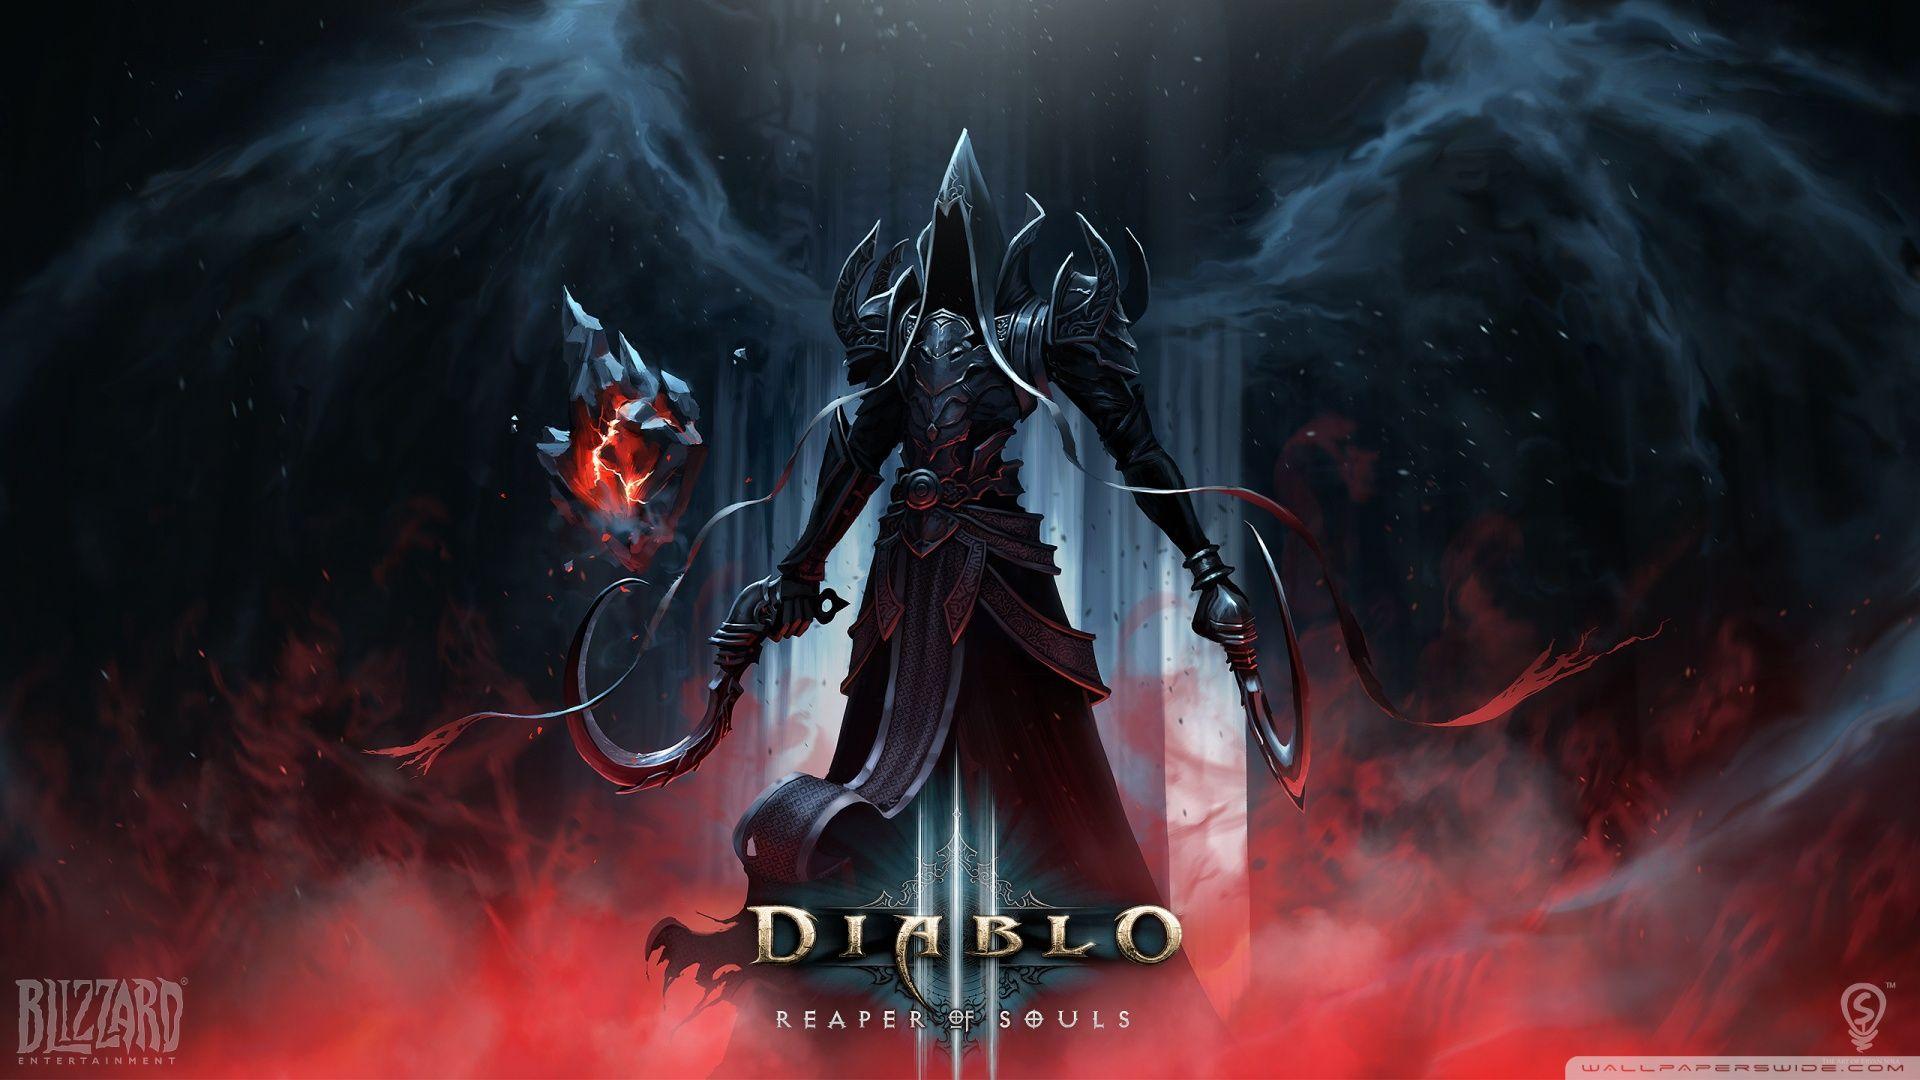 Diablo 3 Wallpaper 1080p Hd Diablo 3 Wallpapers 80 Images 10 Latest Diablo 3 1920x1080 Wallp Cartoon Wallpaper Hd Black Background Wallpaper Dark Wallpaper